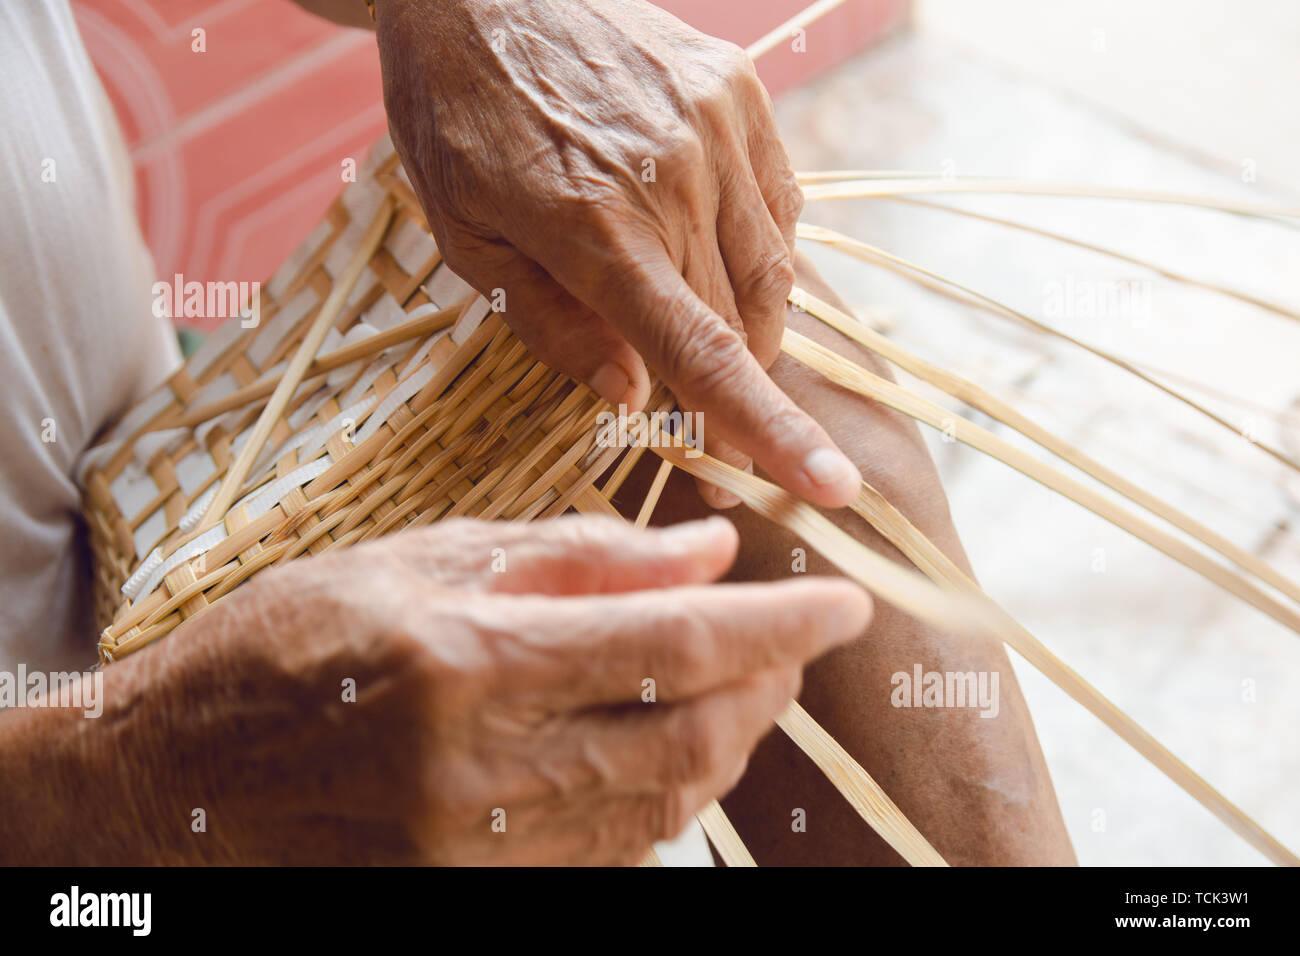 Senior man hands manually weaving bamboo. - Stock Image